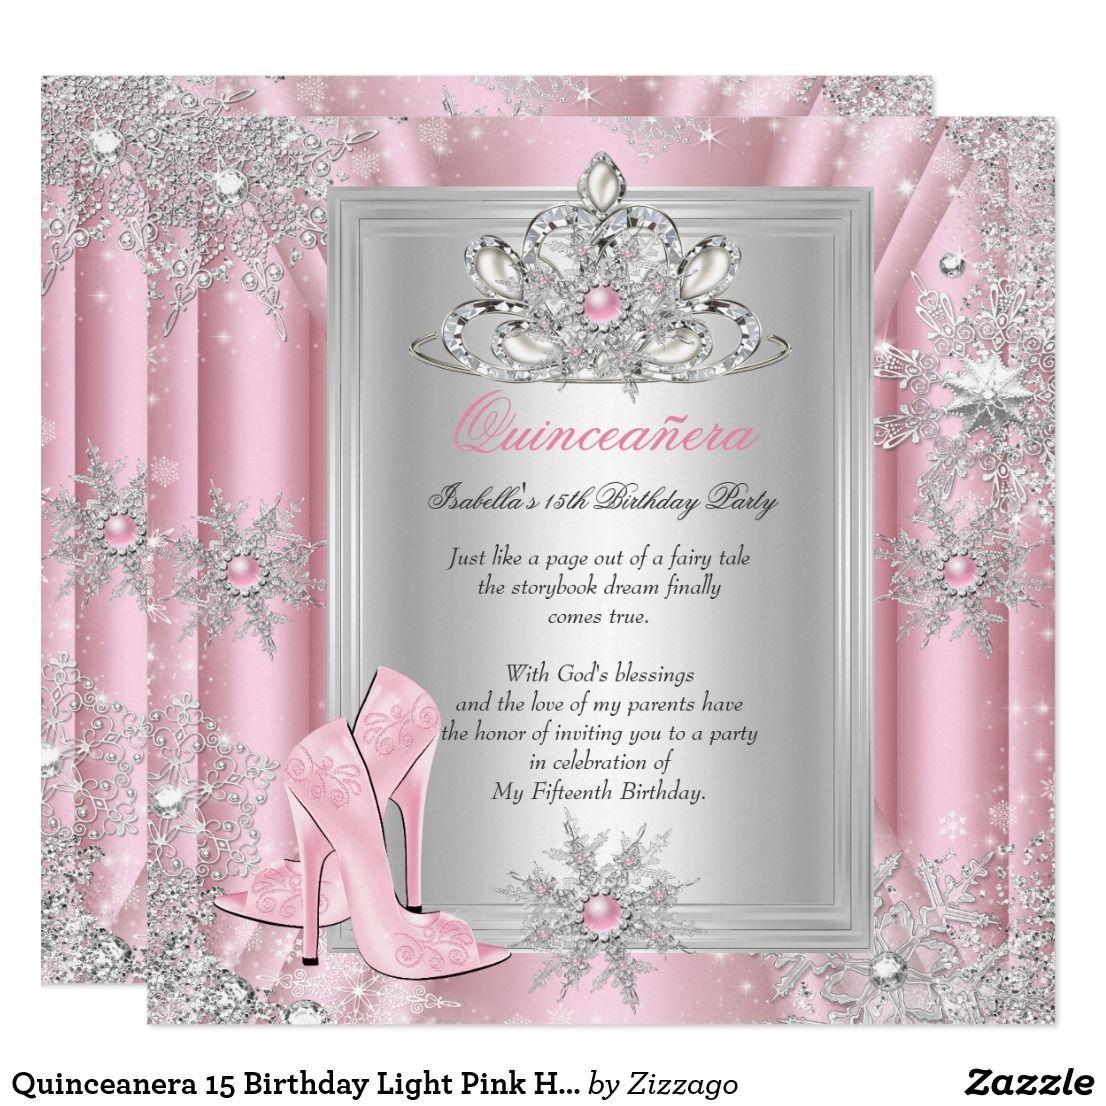 Quinceanera 15 Birthday Light Pink Heels 2 Invitation | Pinterest ...